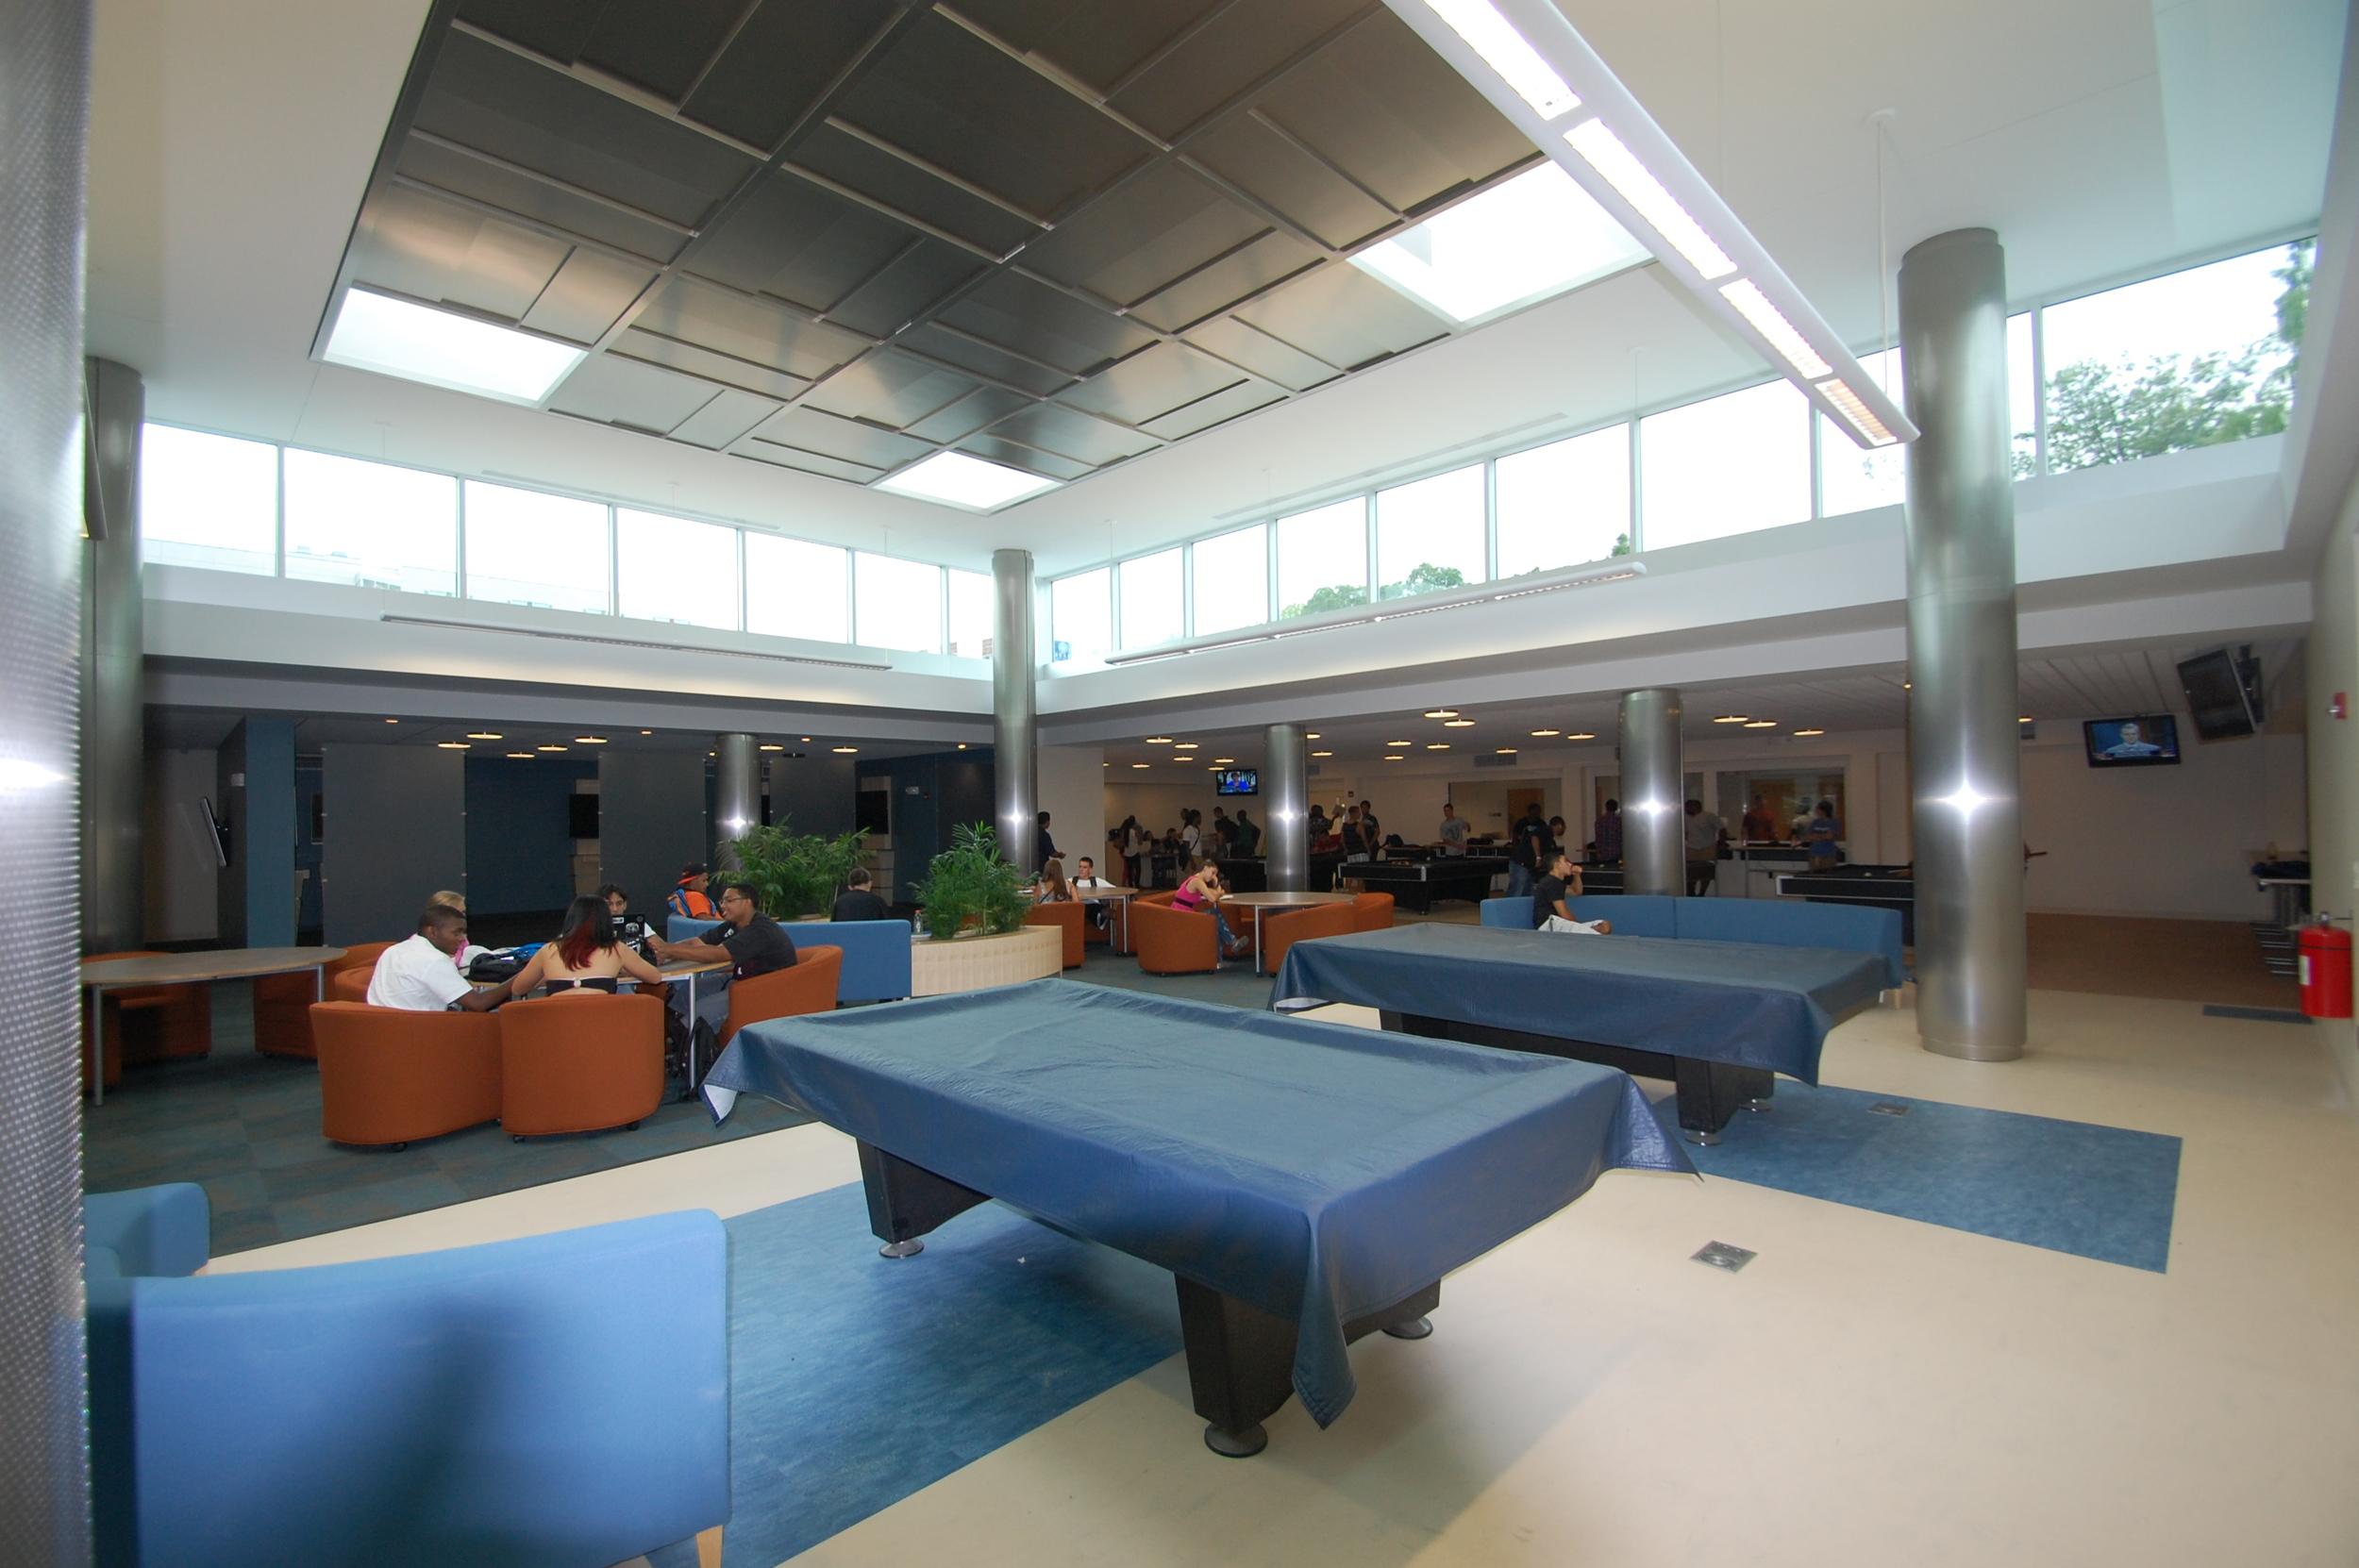 Kean University Sky Room